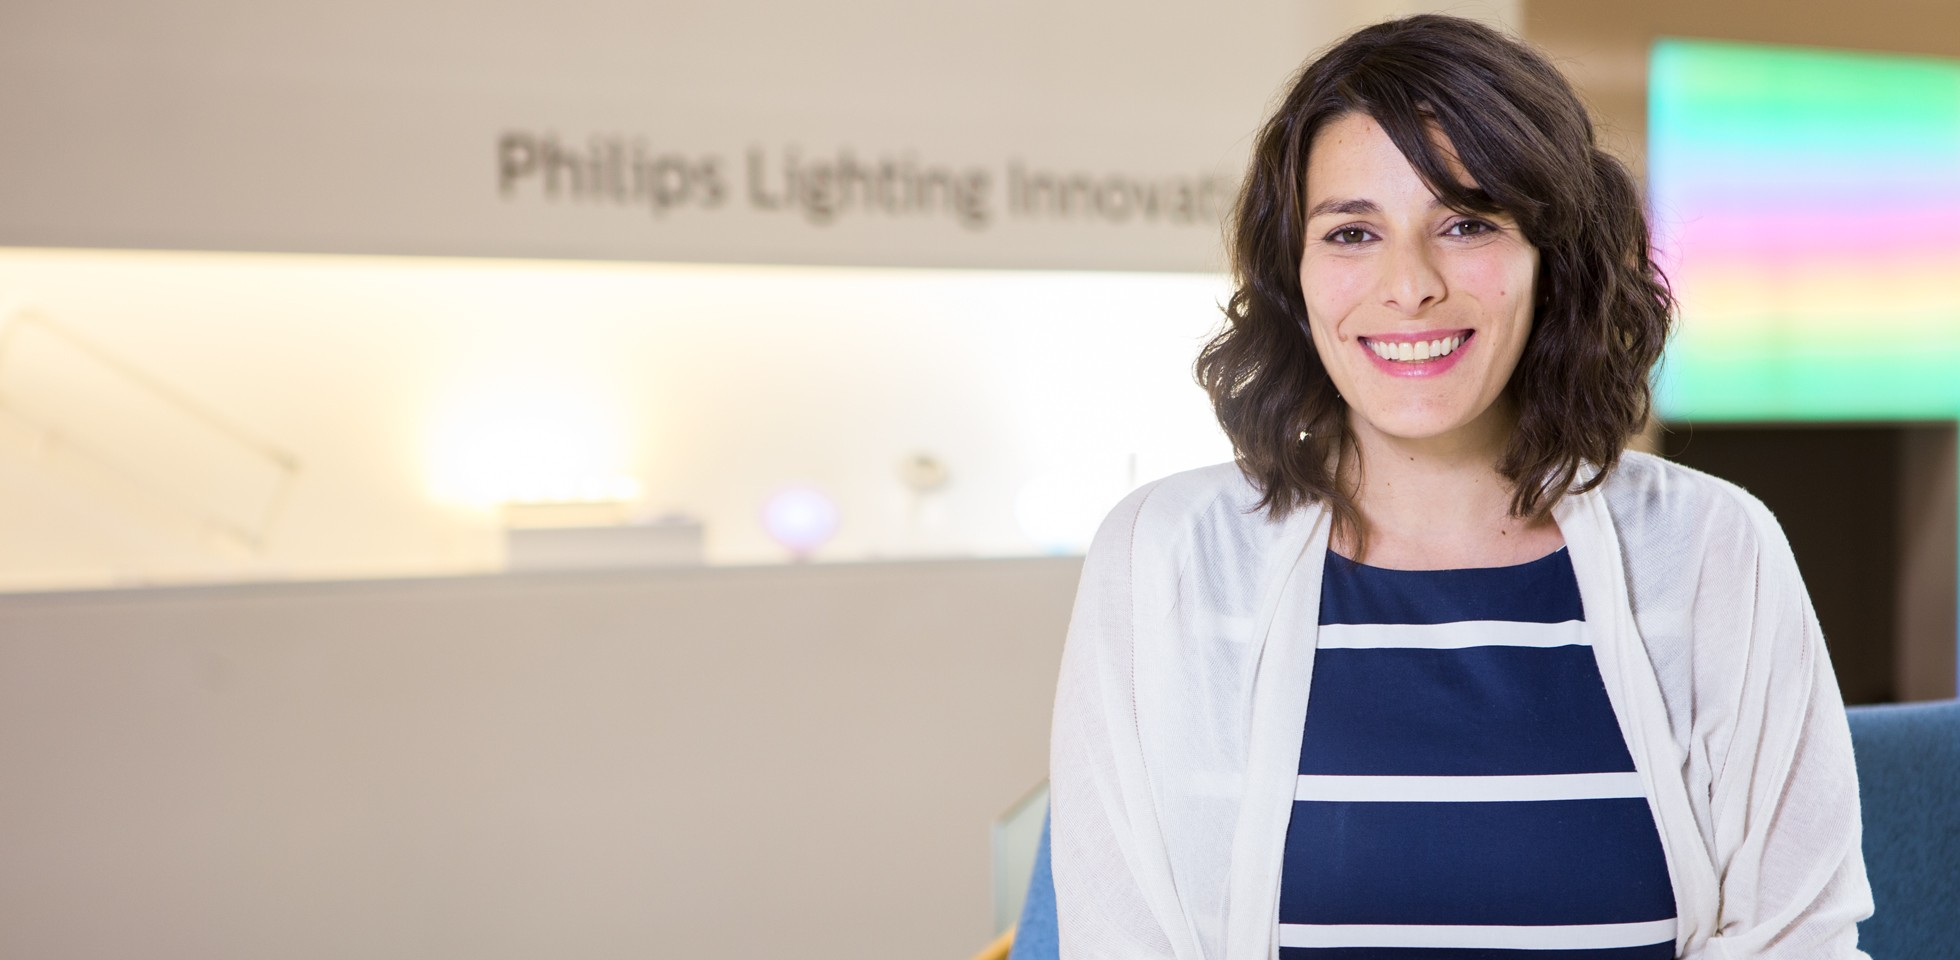 Anabella Mingo, Marketing Manager - Philips Lighting Careers